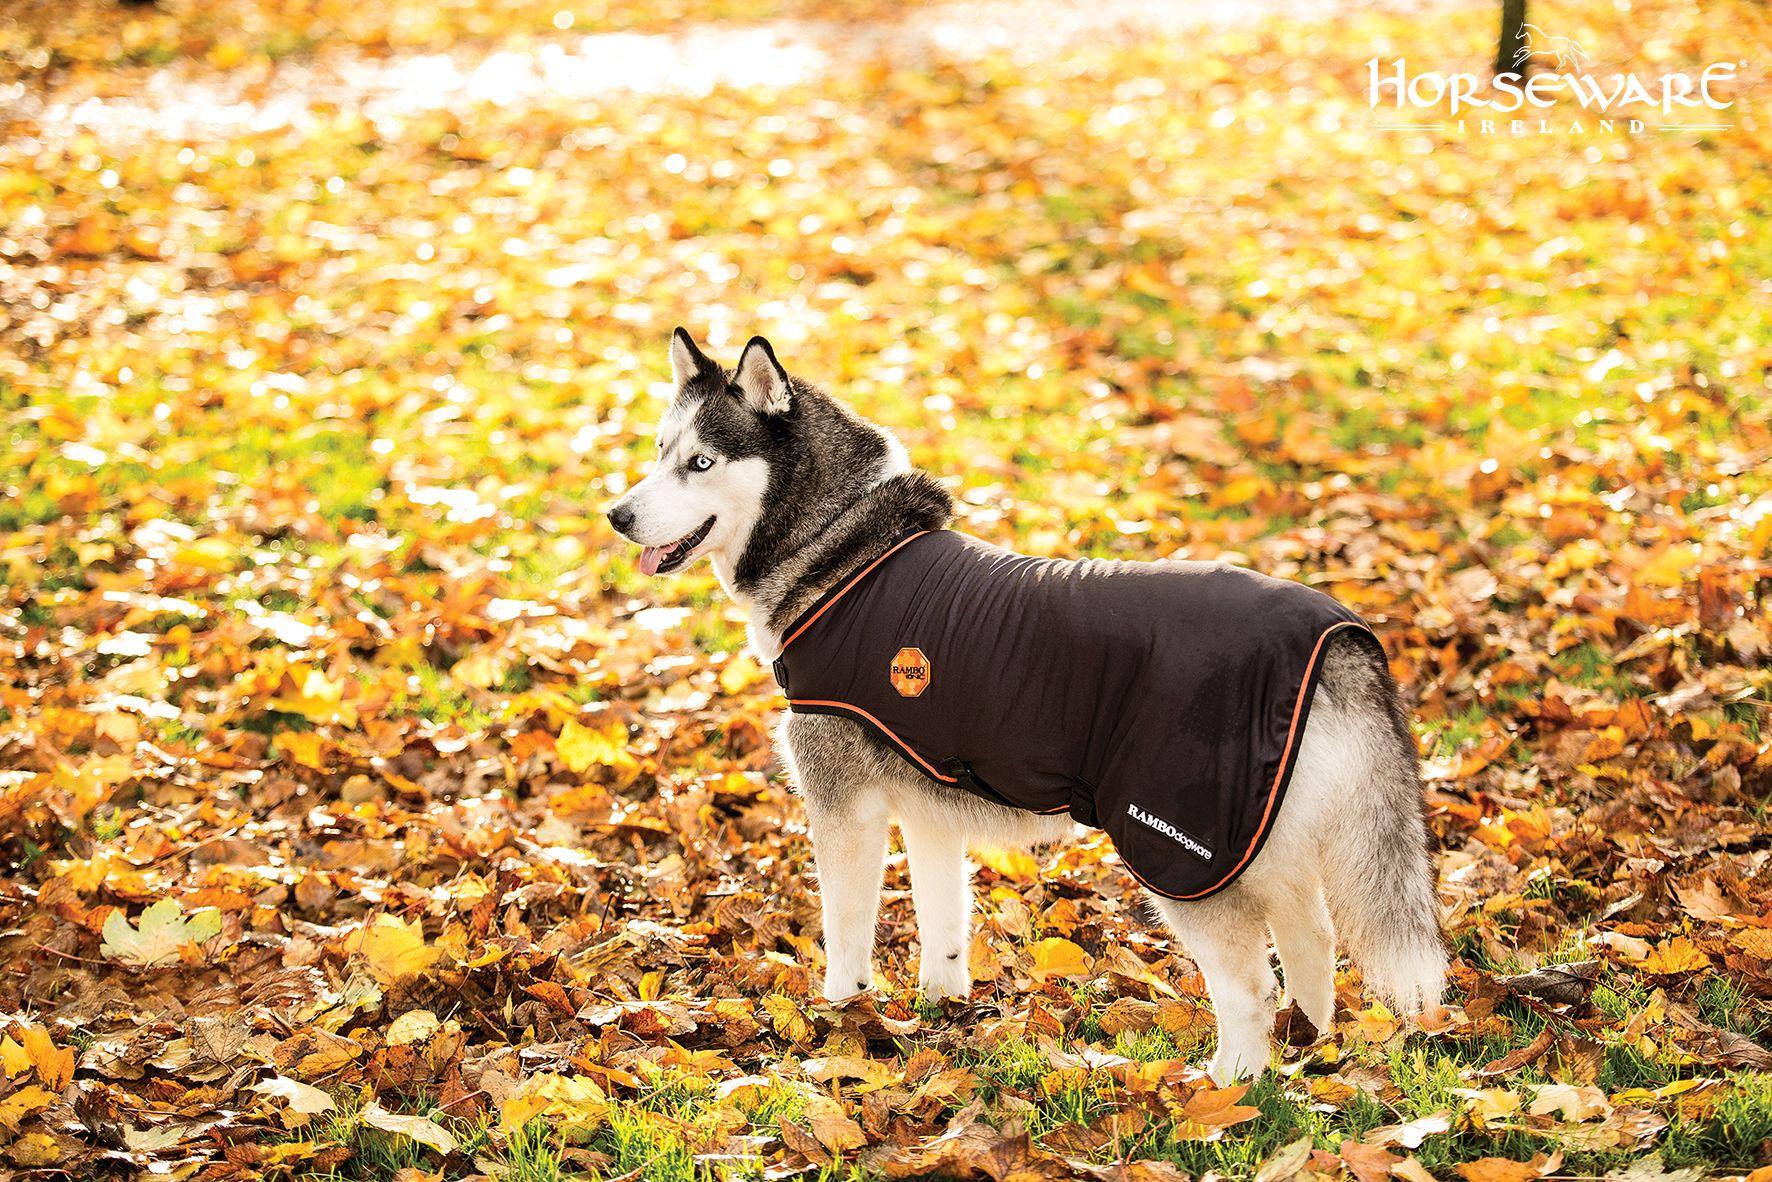 Horseware Rambo Ionic dog rug Dog blanket